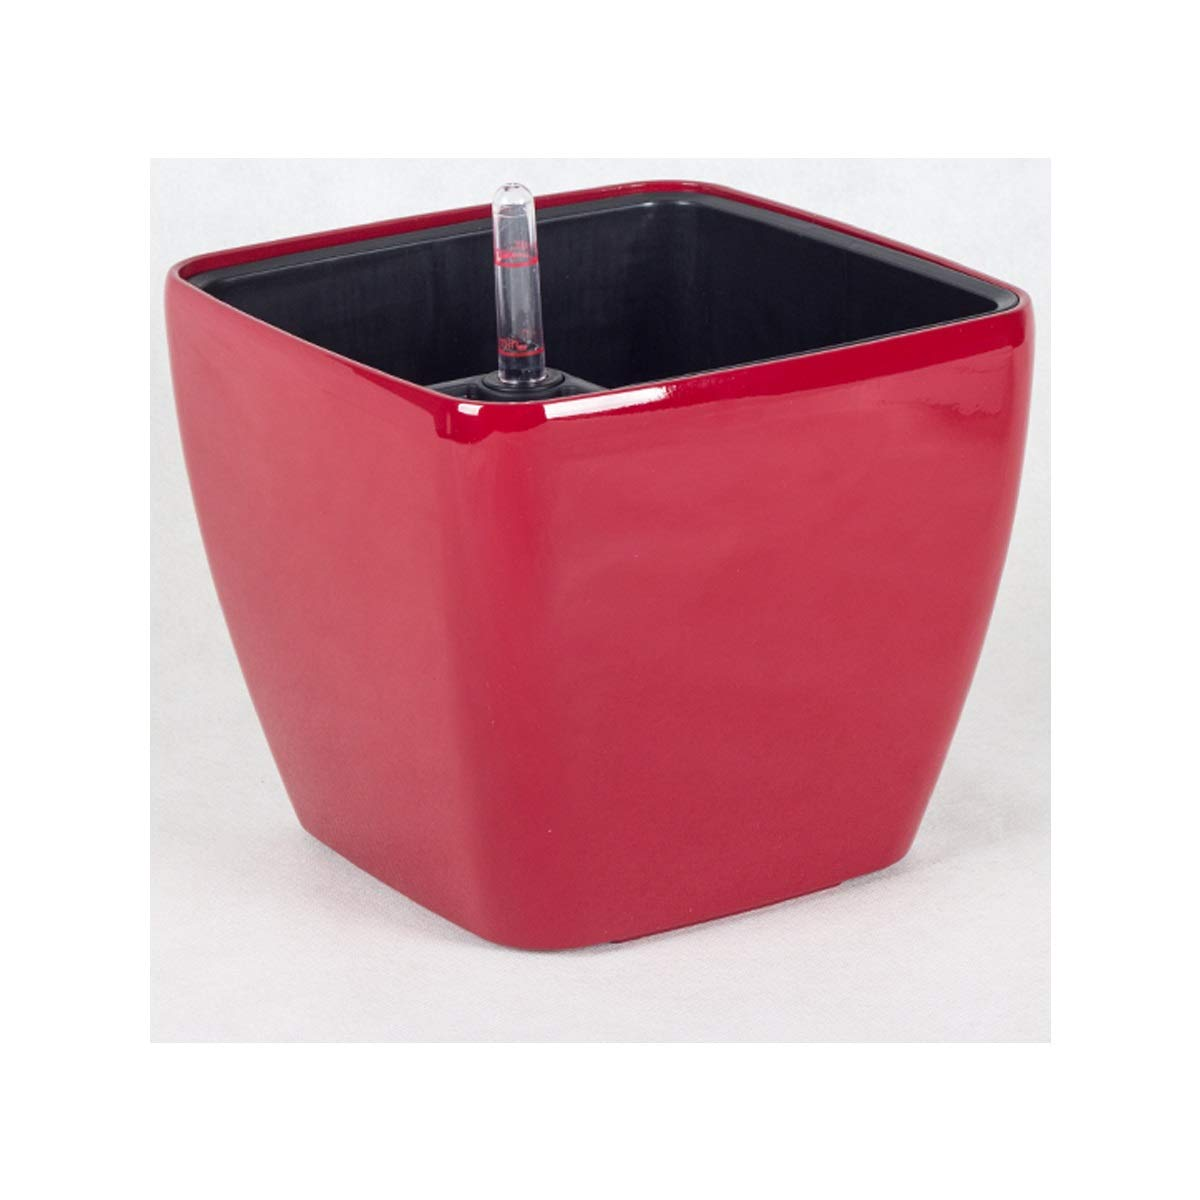 MUZIWENJU Creative Square Automatic Water-Absorbing Flower Pot, Office Desktop Flower Pot (Color : Red, Size : C) by MUZIWENJU